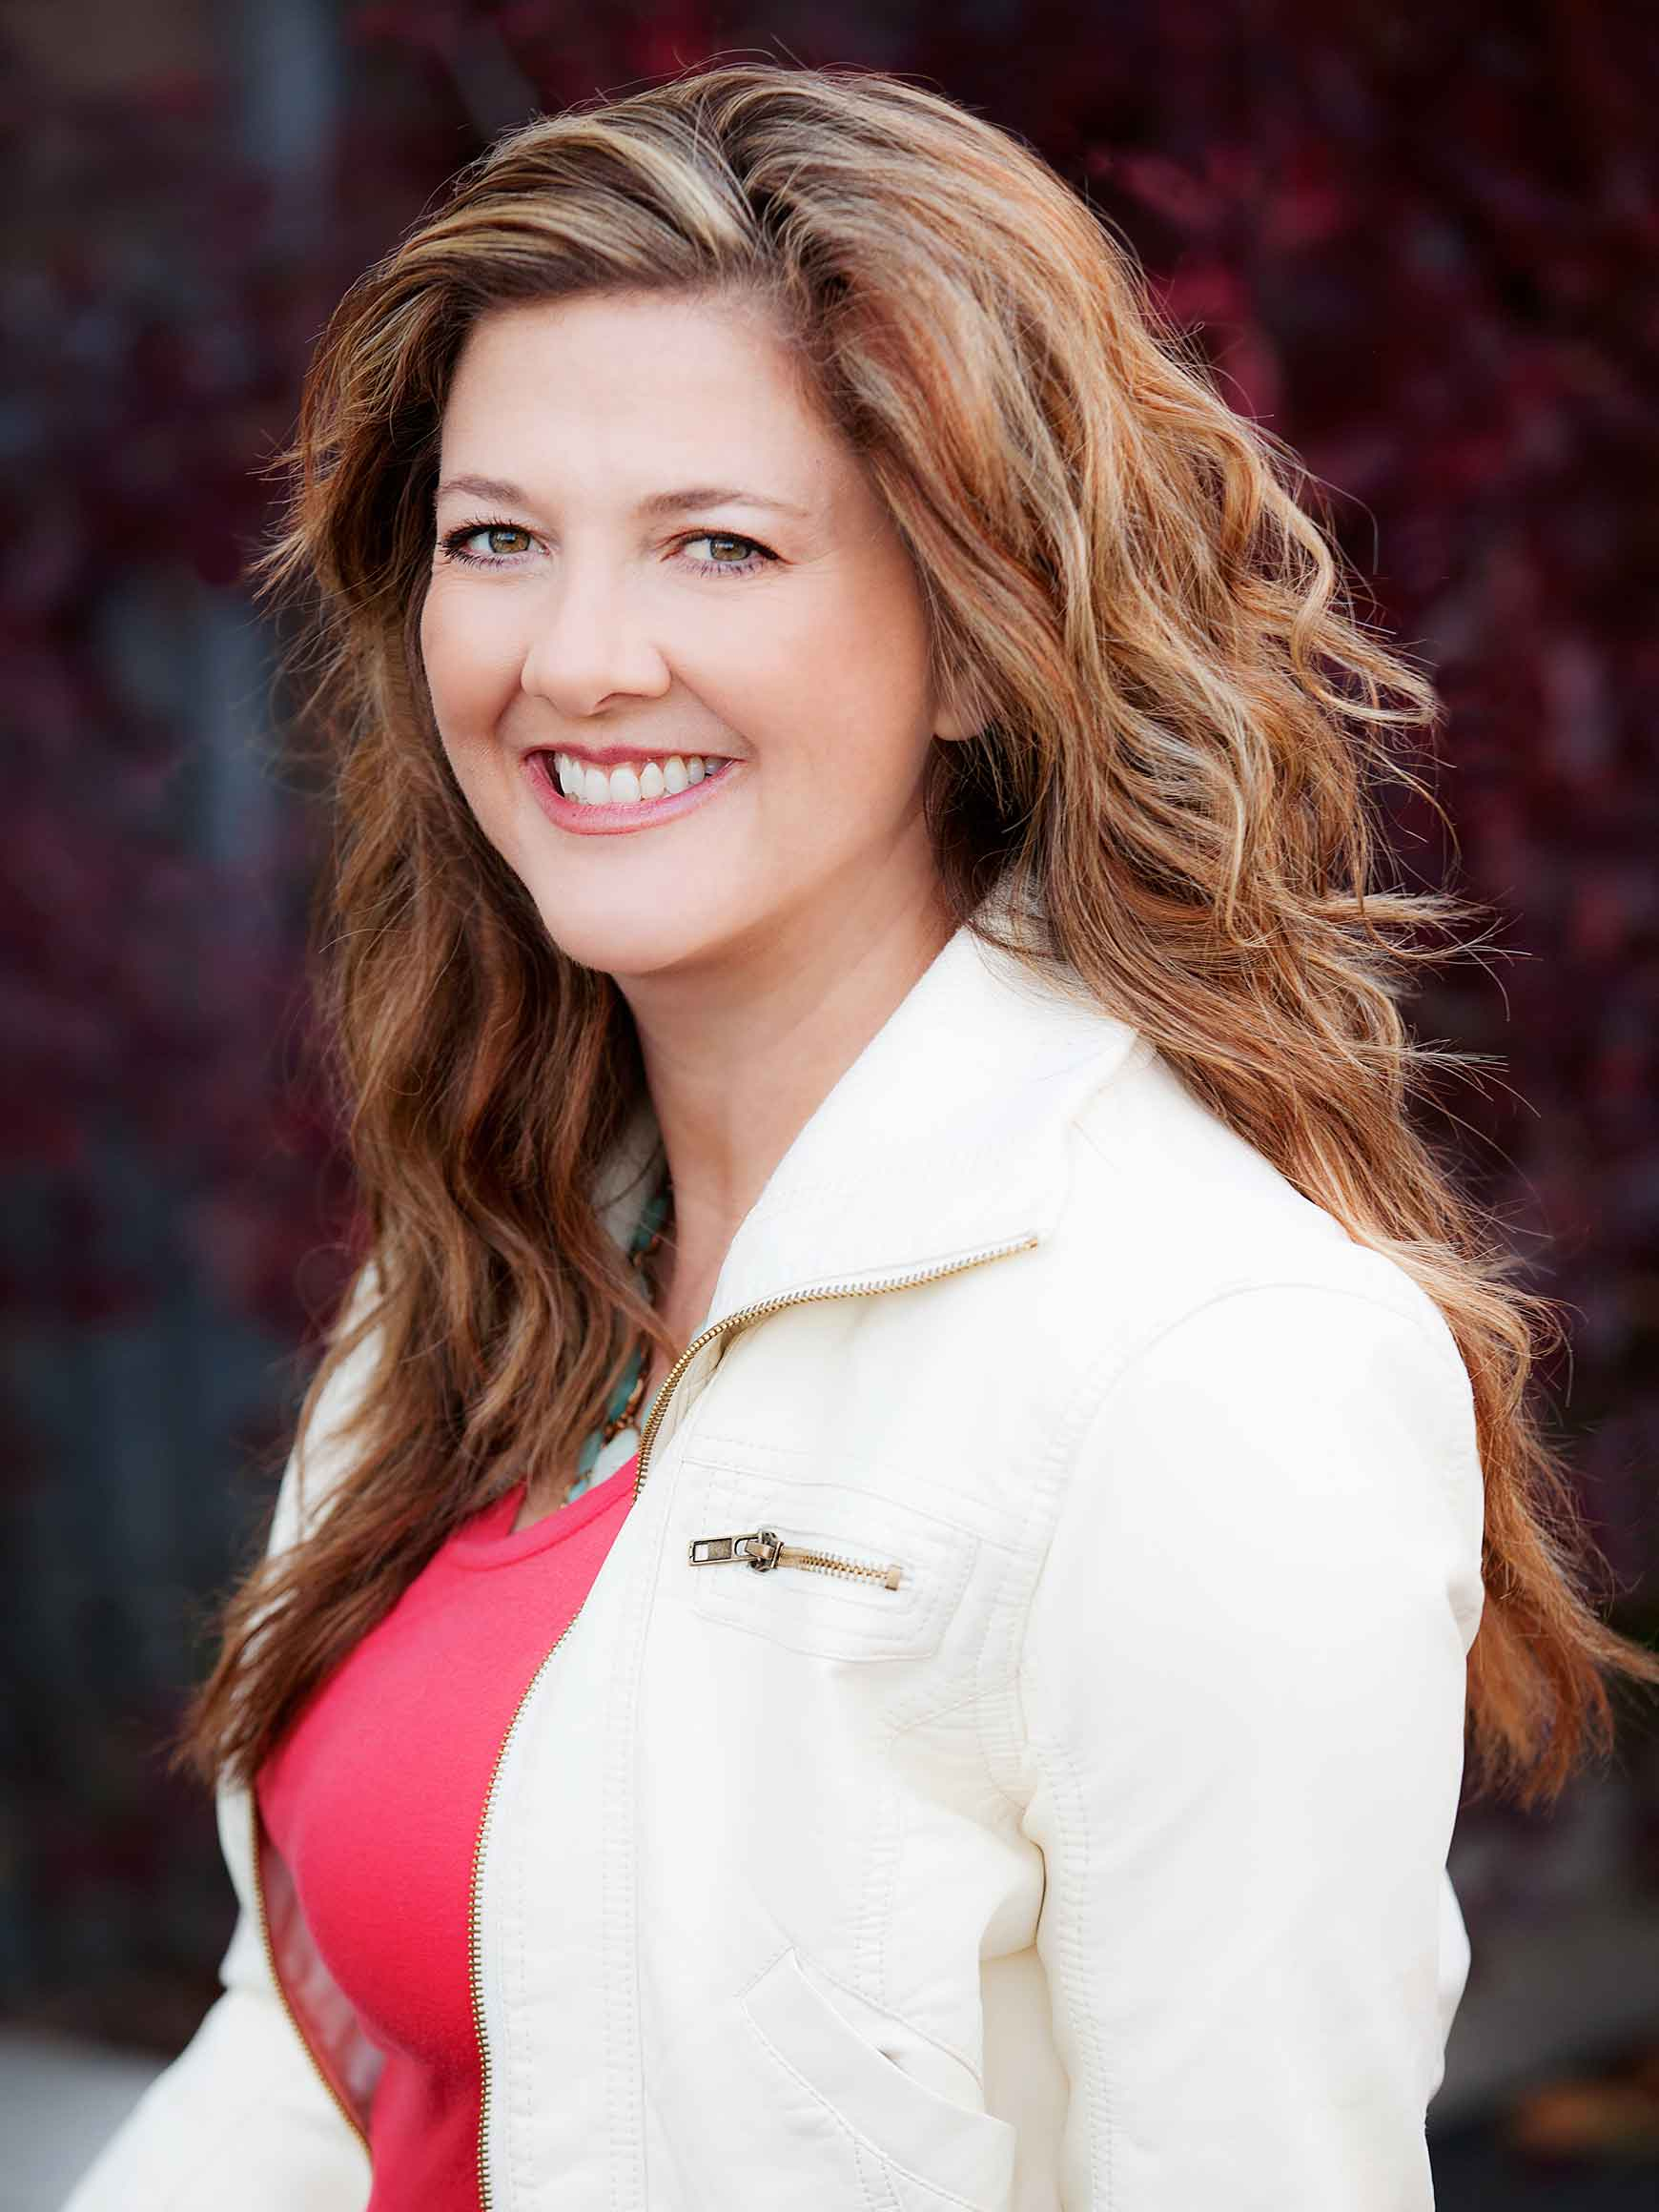 Amy Lyman